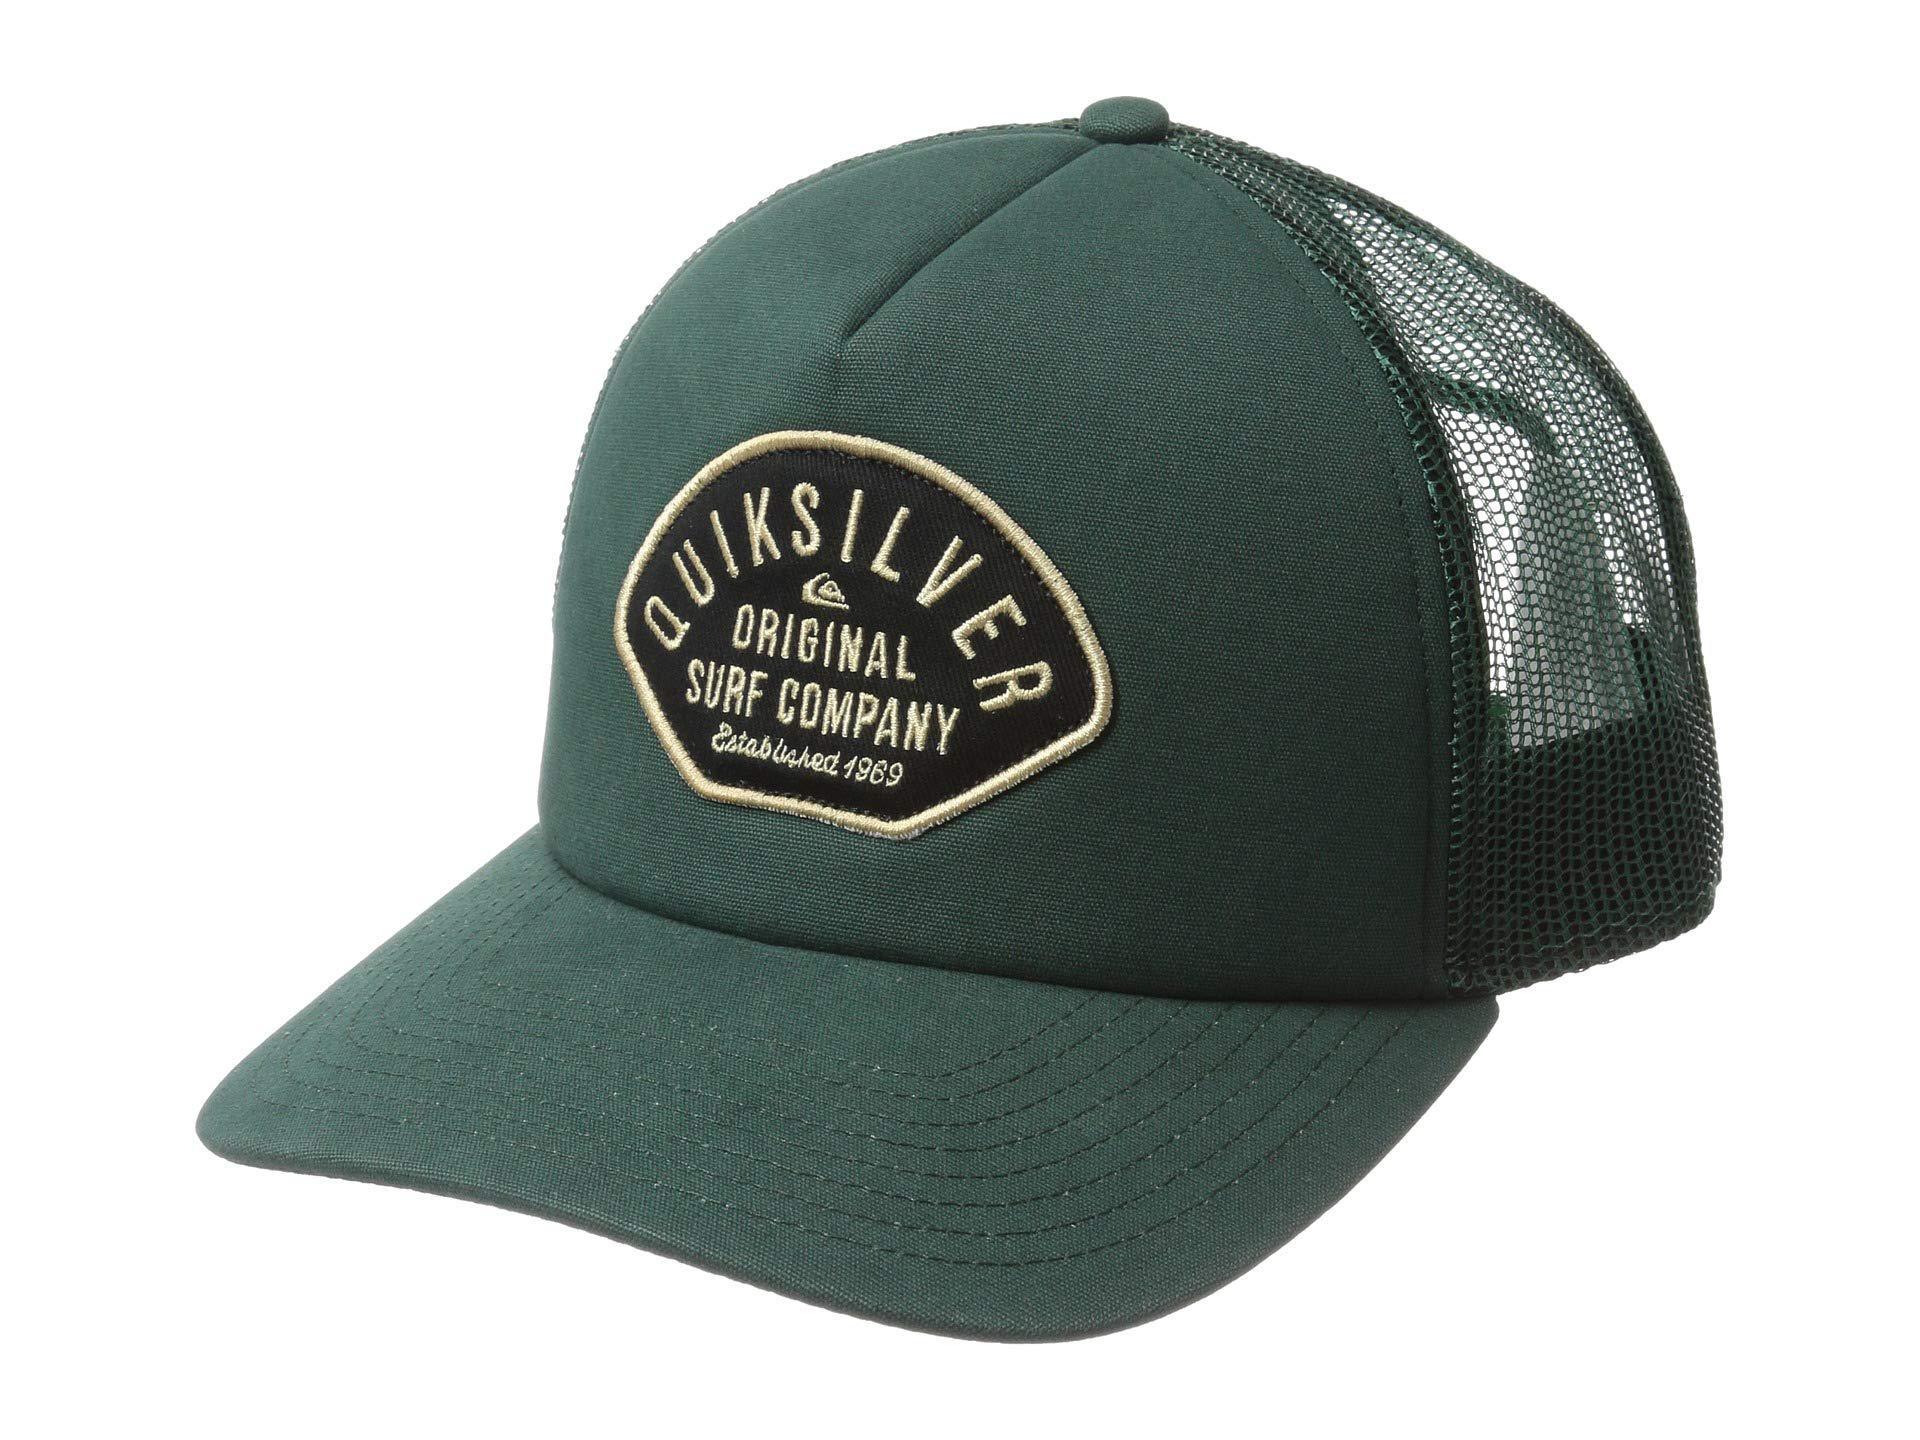 ... coupon code for lyst quiksilver papa duece curve hat white caps in  green for men eba13 a2e5de23b7b